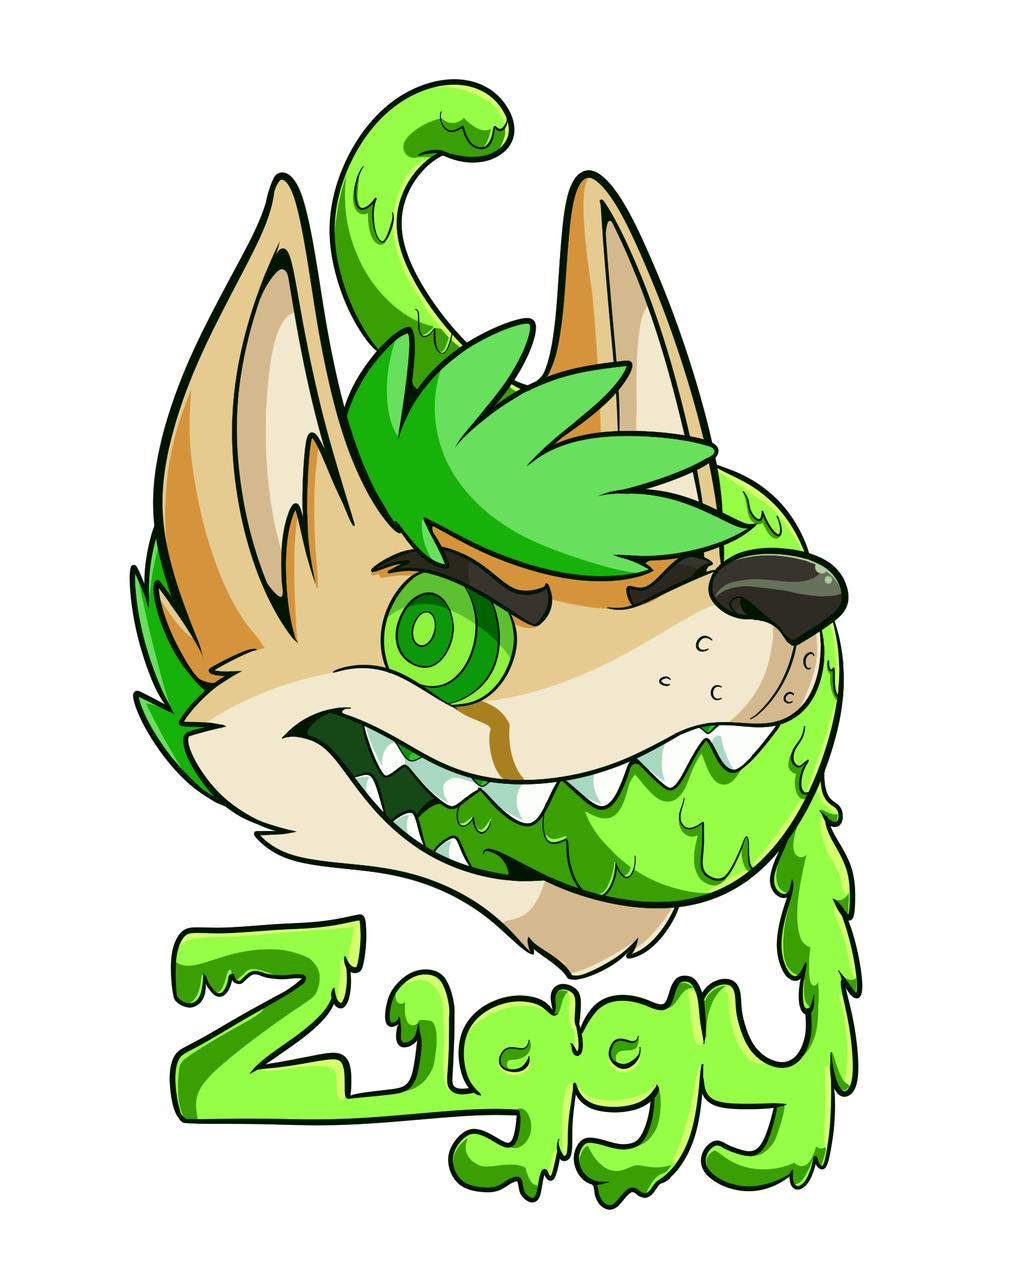 Ziggy Badge